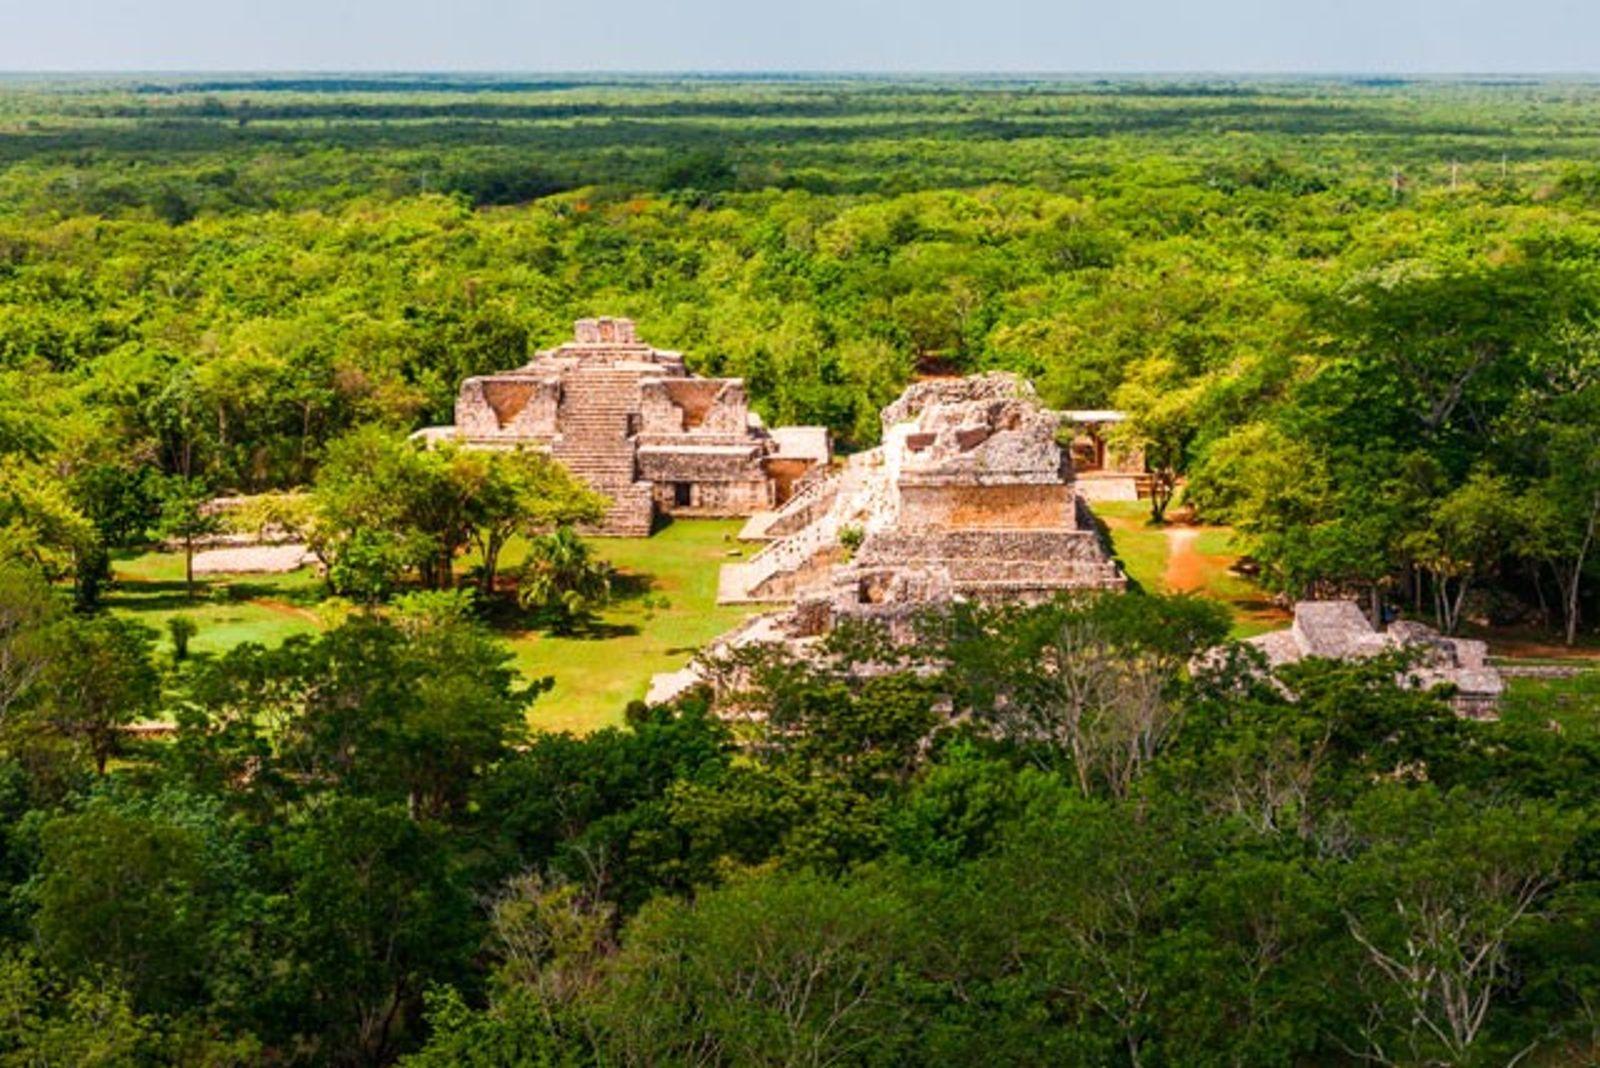 Mexico: Tomb of the ancient Maya king